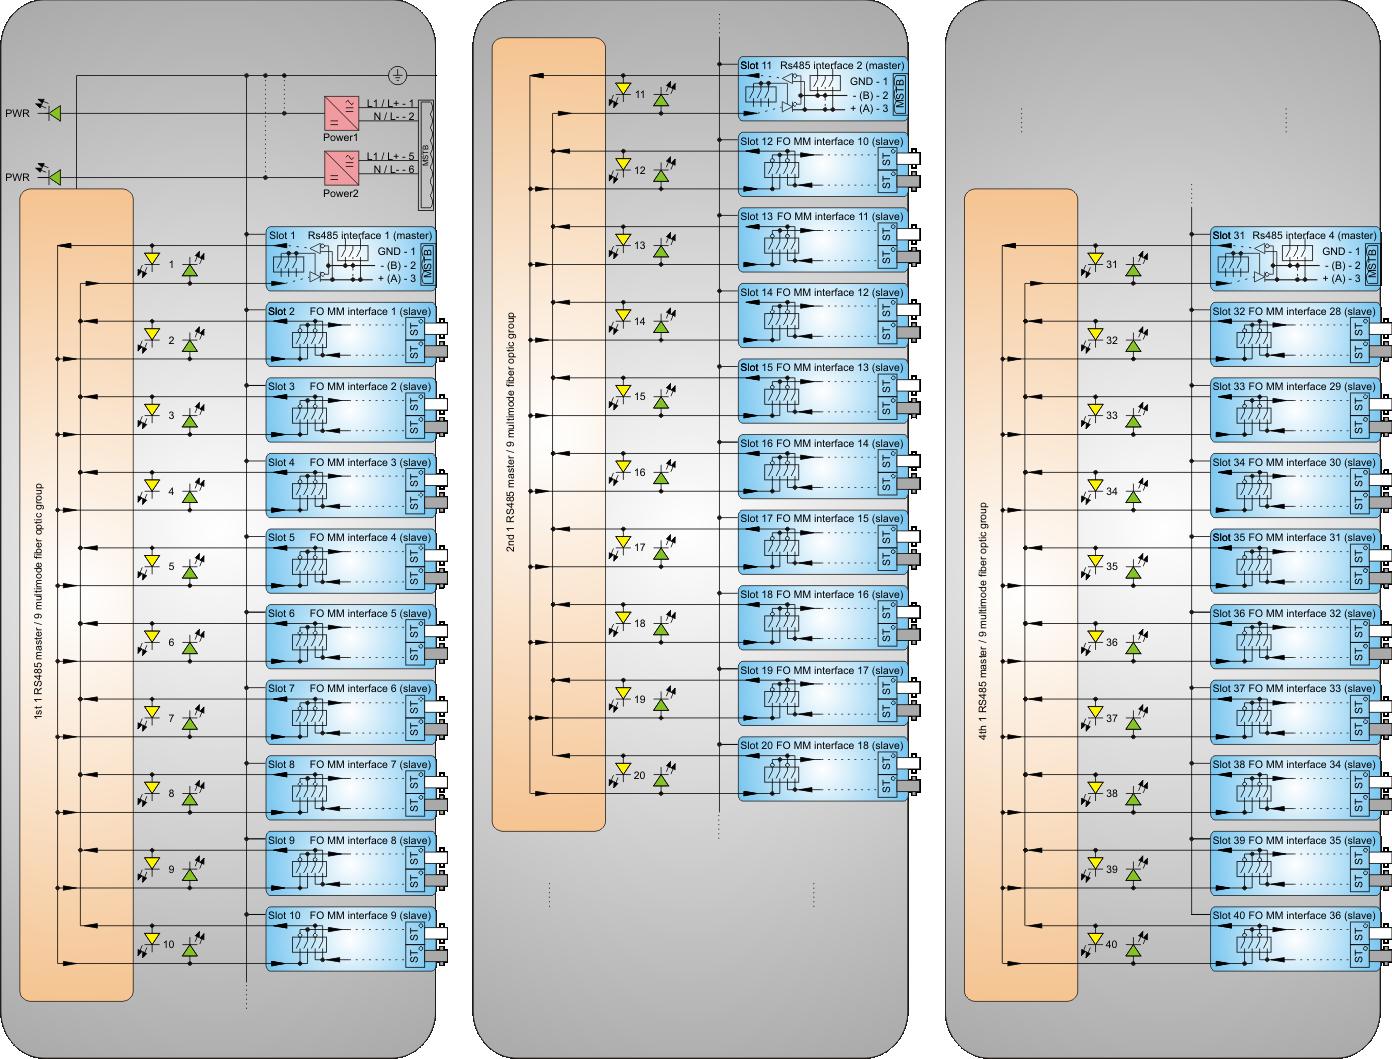 Rs232rs485fiber Optics100base Tx100base Fx Converters Coupler Schematic